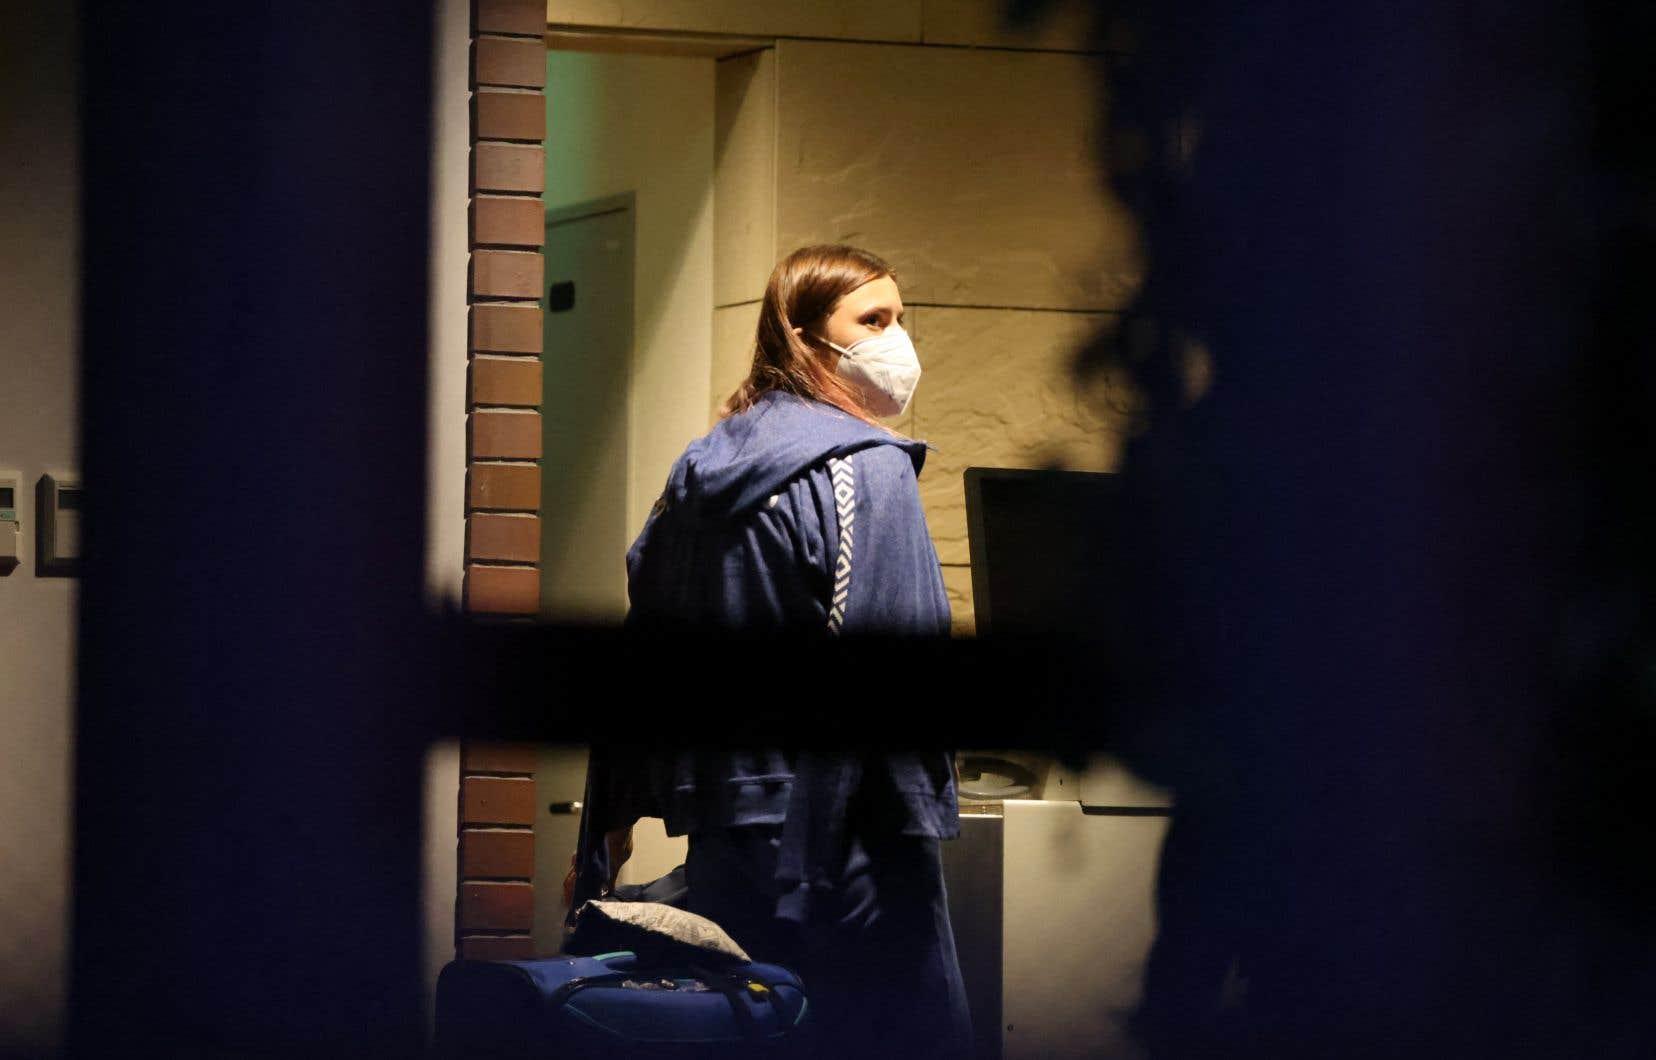 La sprinteuse Krystsina Tsimanouskaya s'est réfugiée lundi à l'ambassade polonaise à Tokyo.